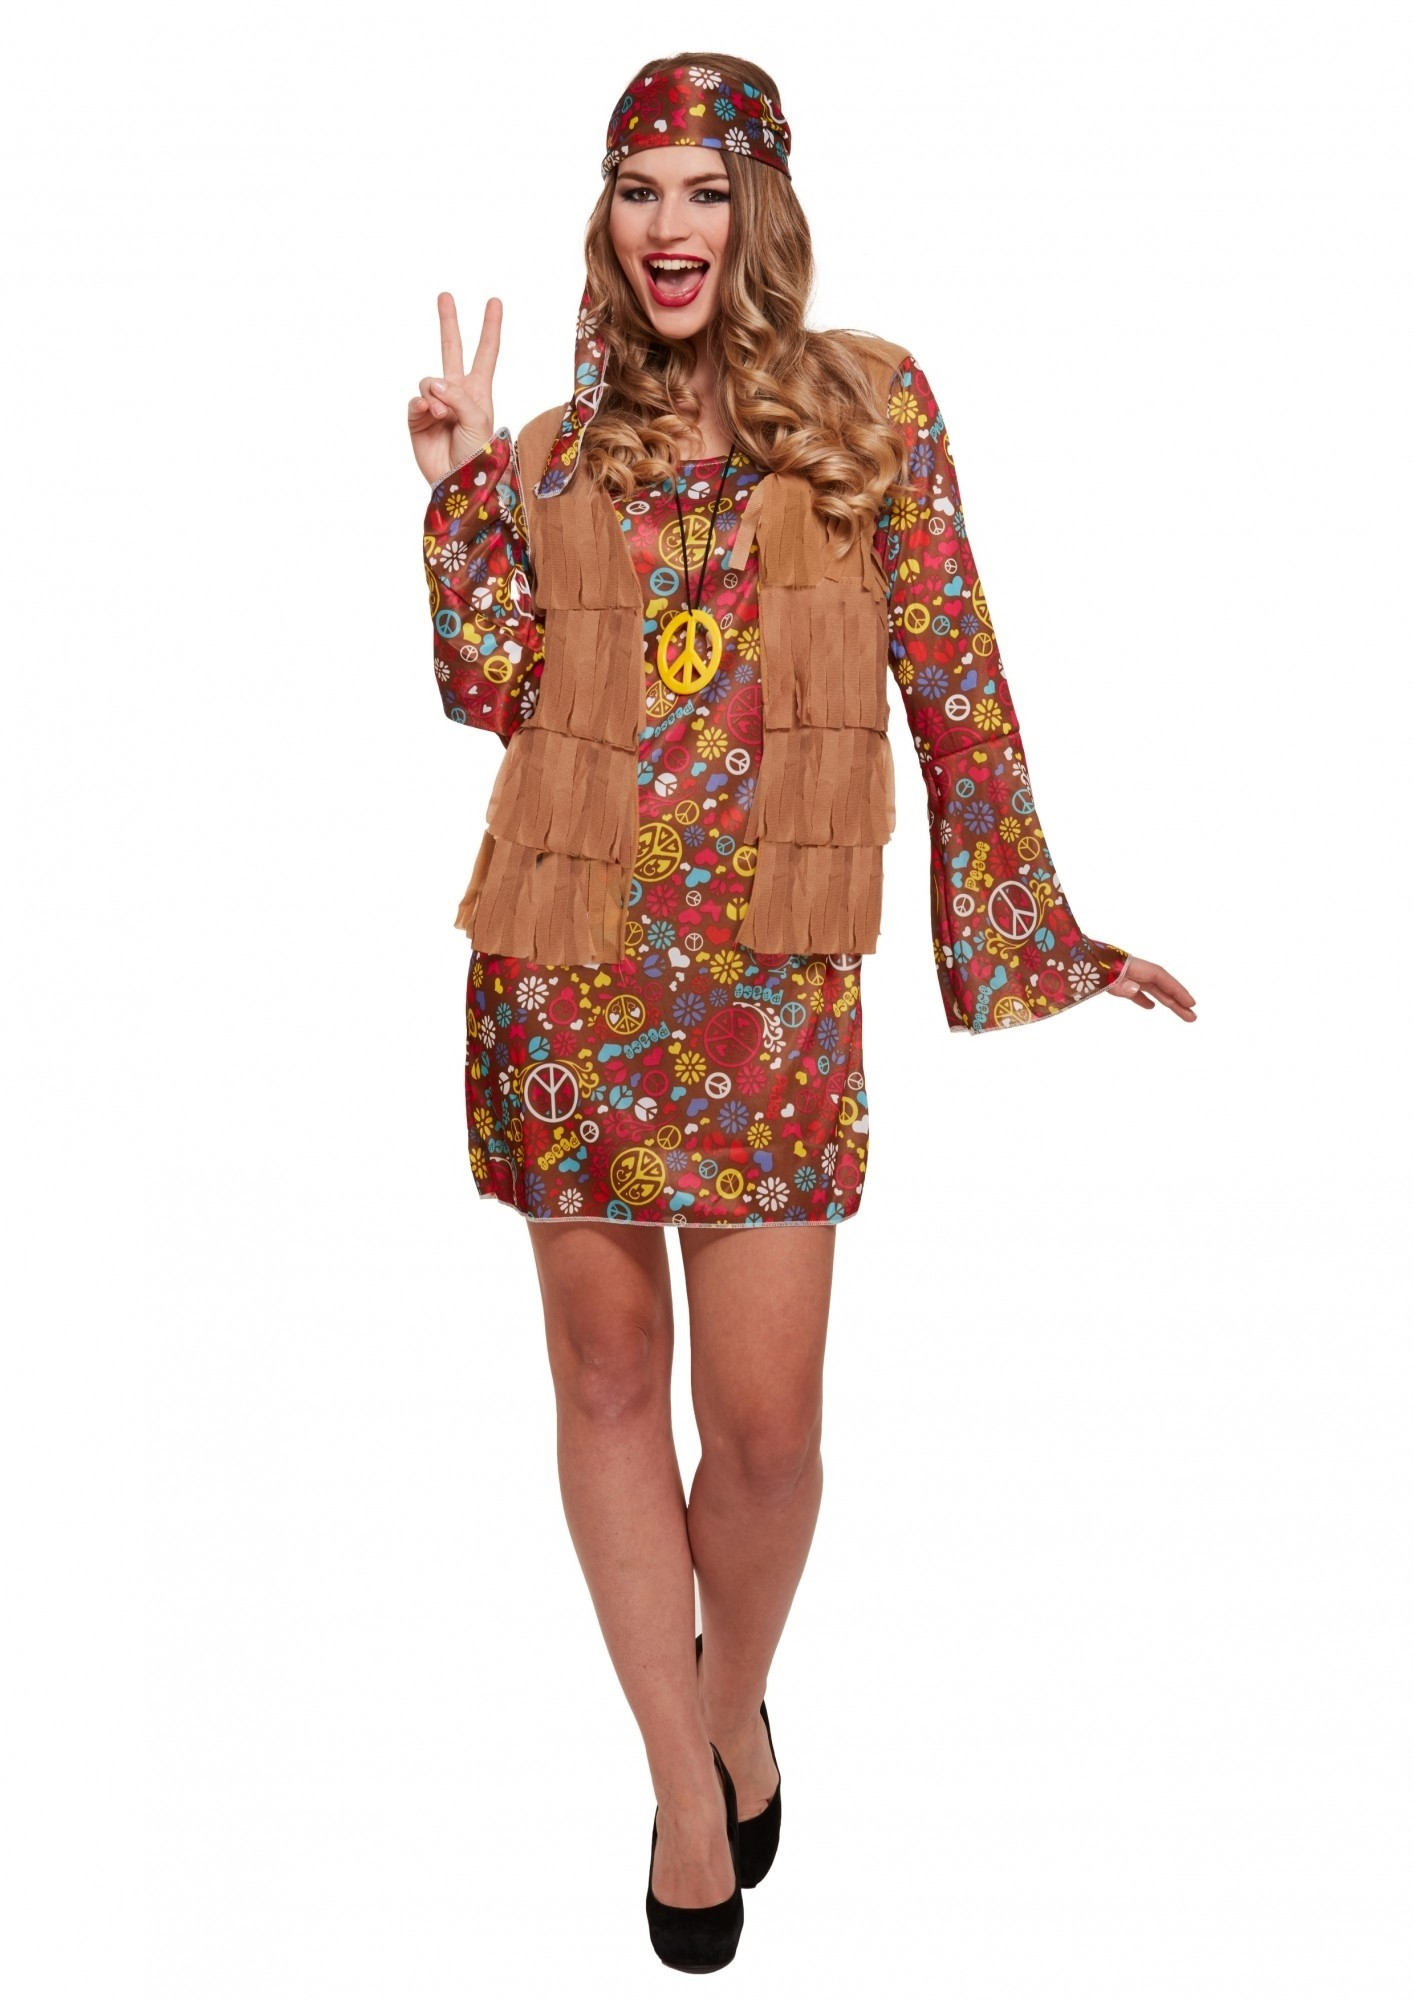 65ab23abe3c100 Hippie jurkje groovy - Confettifeest.nl